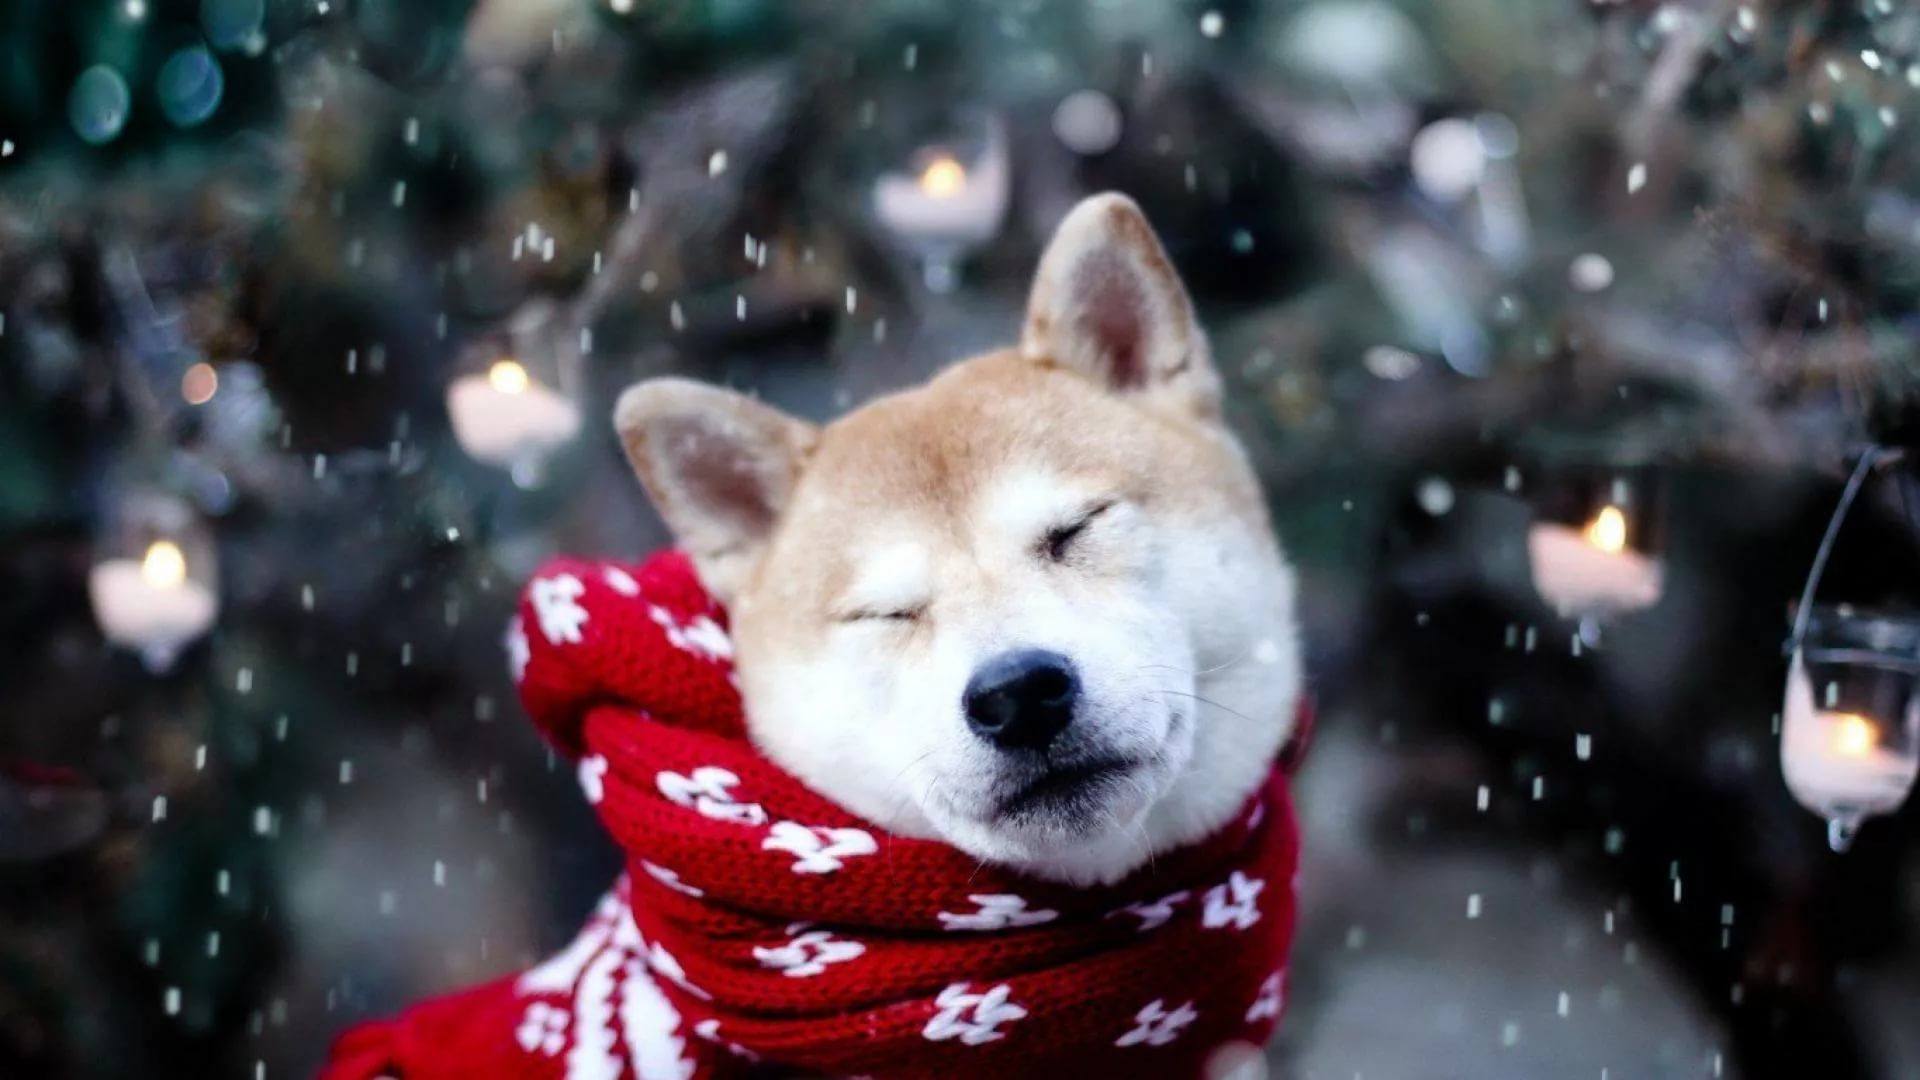 Cute Winter wallpaper picture hd